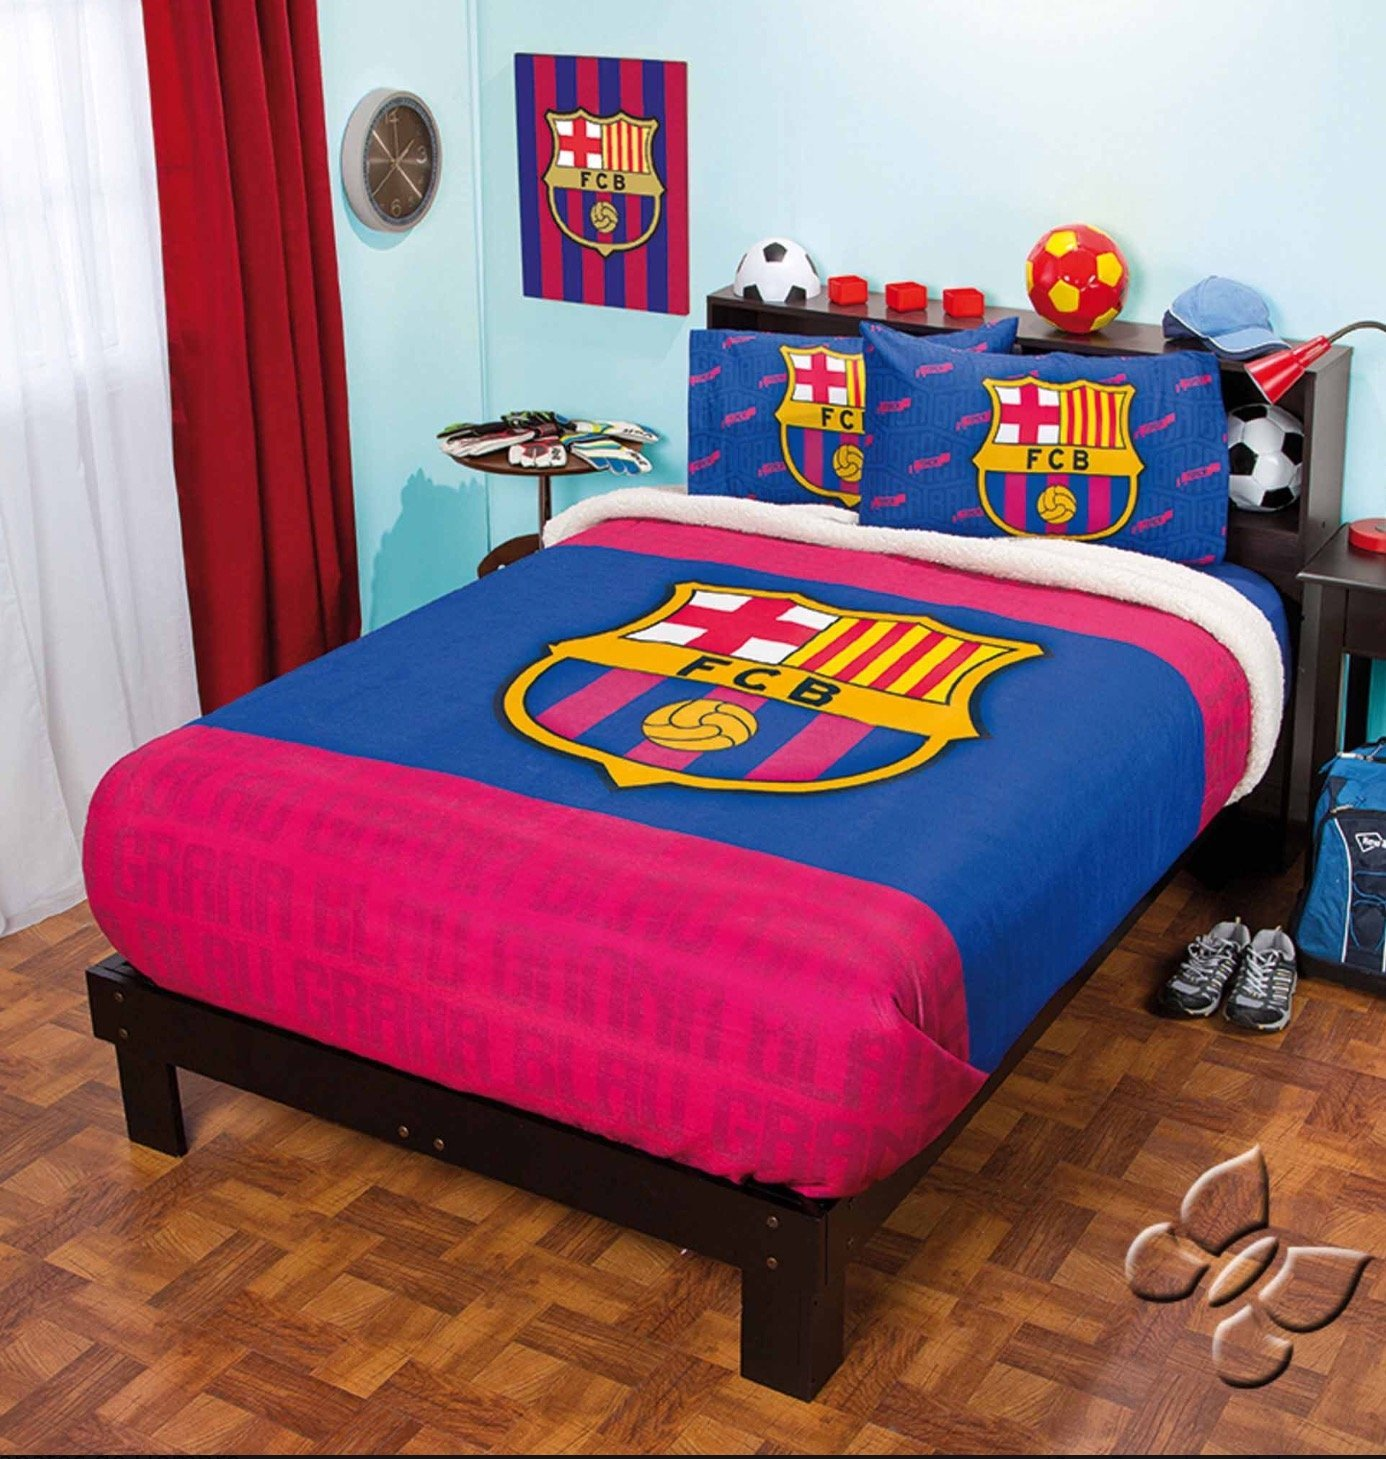 BARCELONA FOOTBALL CLUB ORIGINAL FUZZY FLEECE BLANKET,SHEET SET AND WINDOWS PANLES 6 PCS TWIN